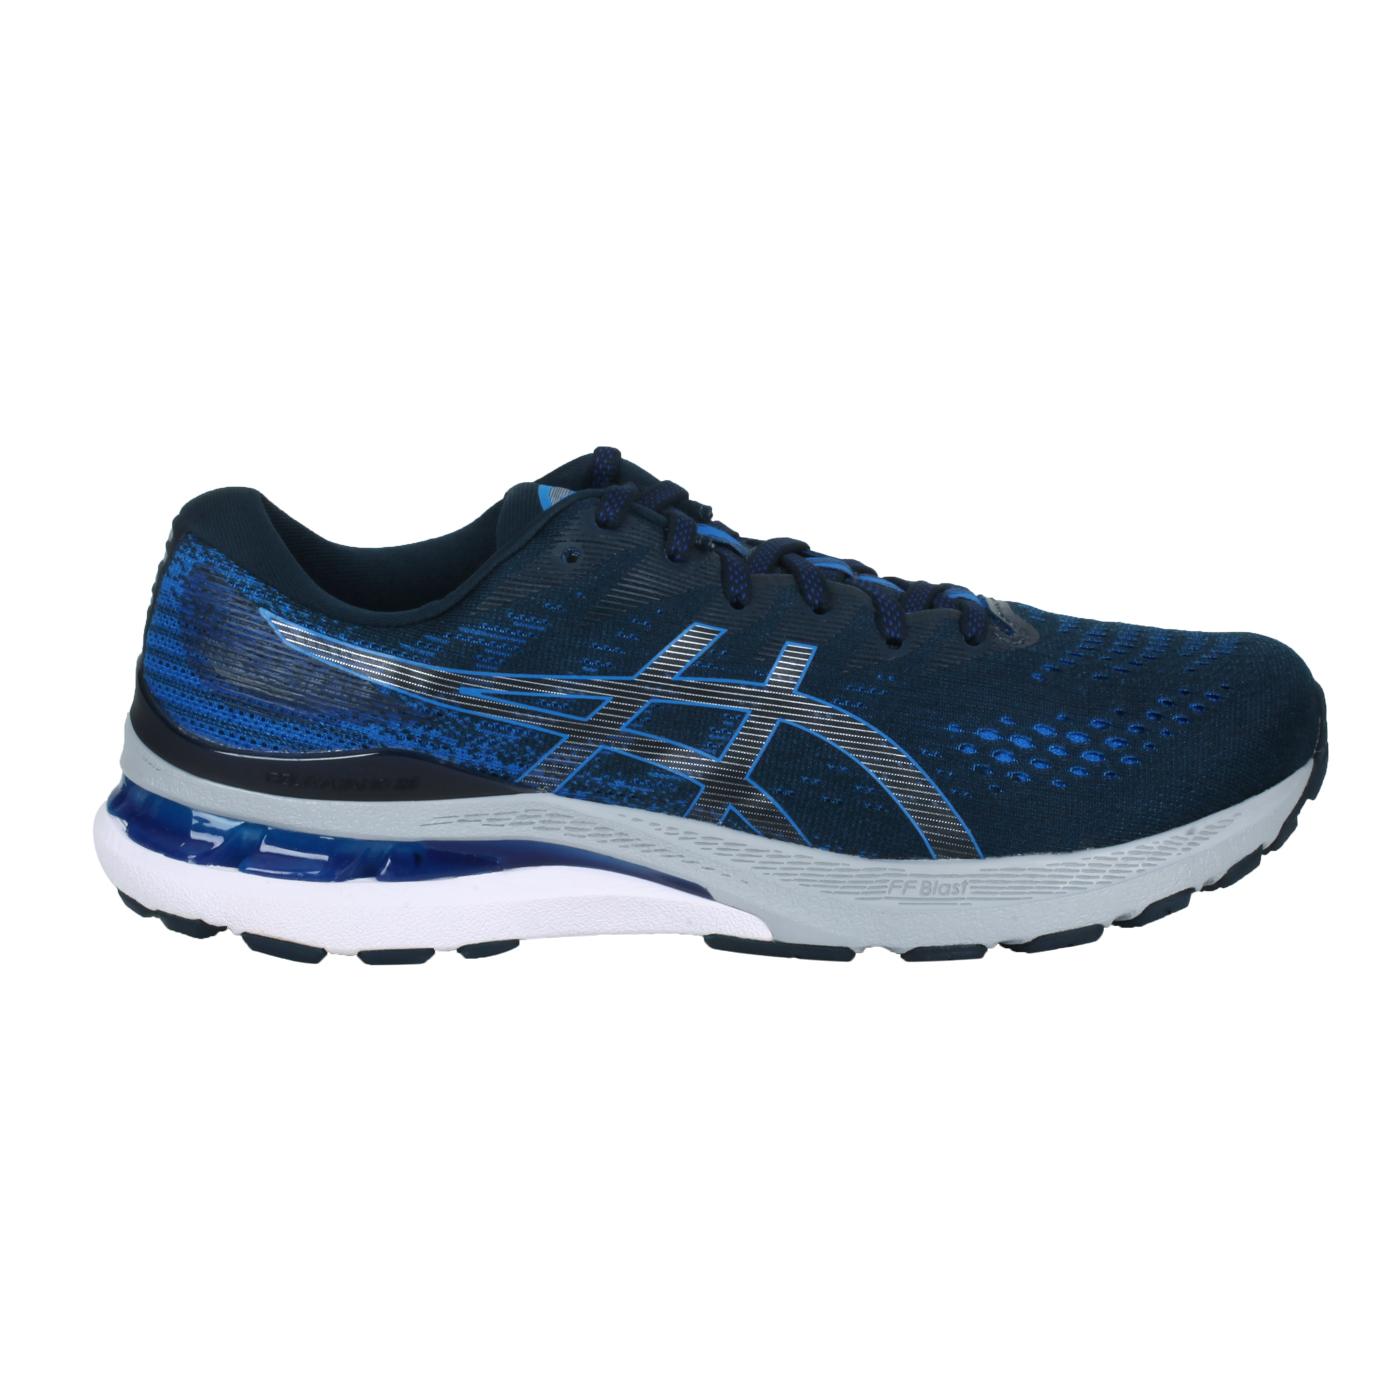 ASICS 男款慢跑鞋-2E  @GEL-KAYANO 28@1011B188-400